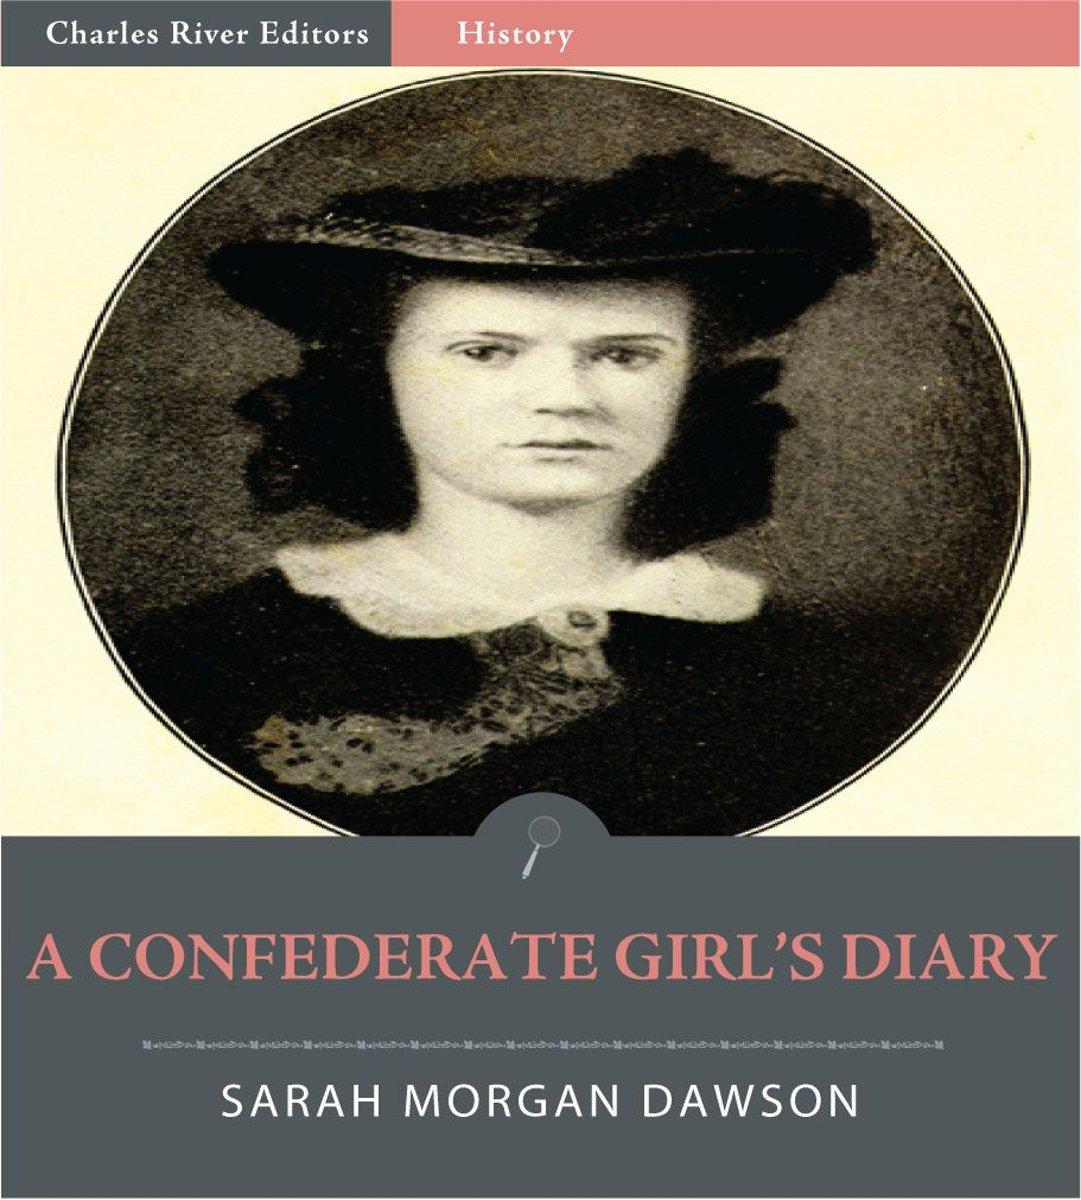 bol.com | A Confederate Girls Diary (Illustrated Edition) (ebook), Sarah  Morgan Dawson |.